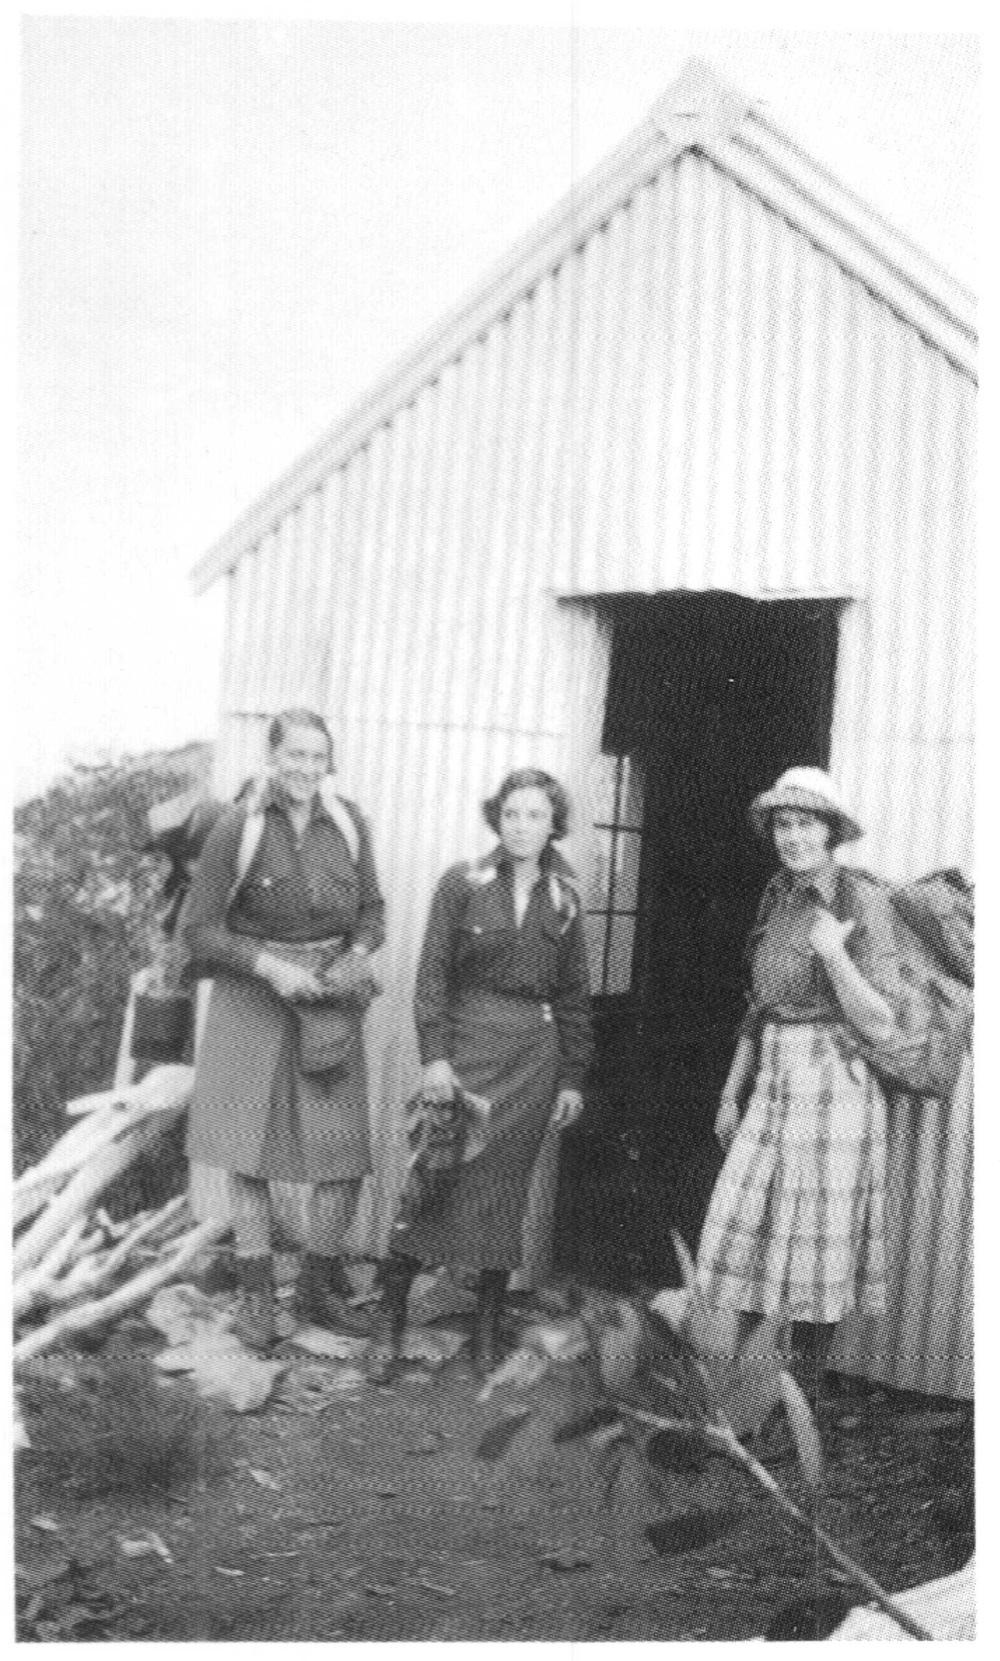 Jeane Gardner, Marjorie Carr, Margaret Pearson at Razorback Hut in December 1932. Rhoda Gardner